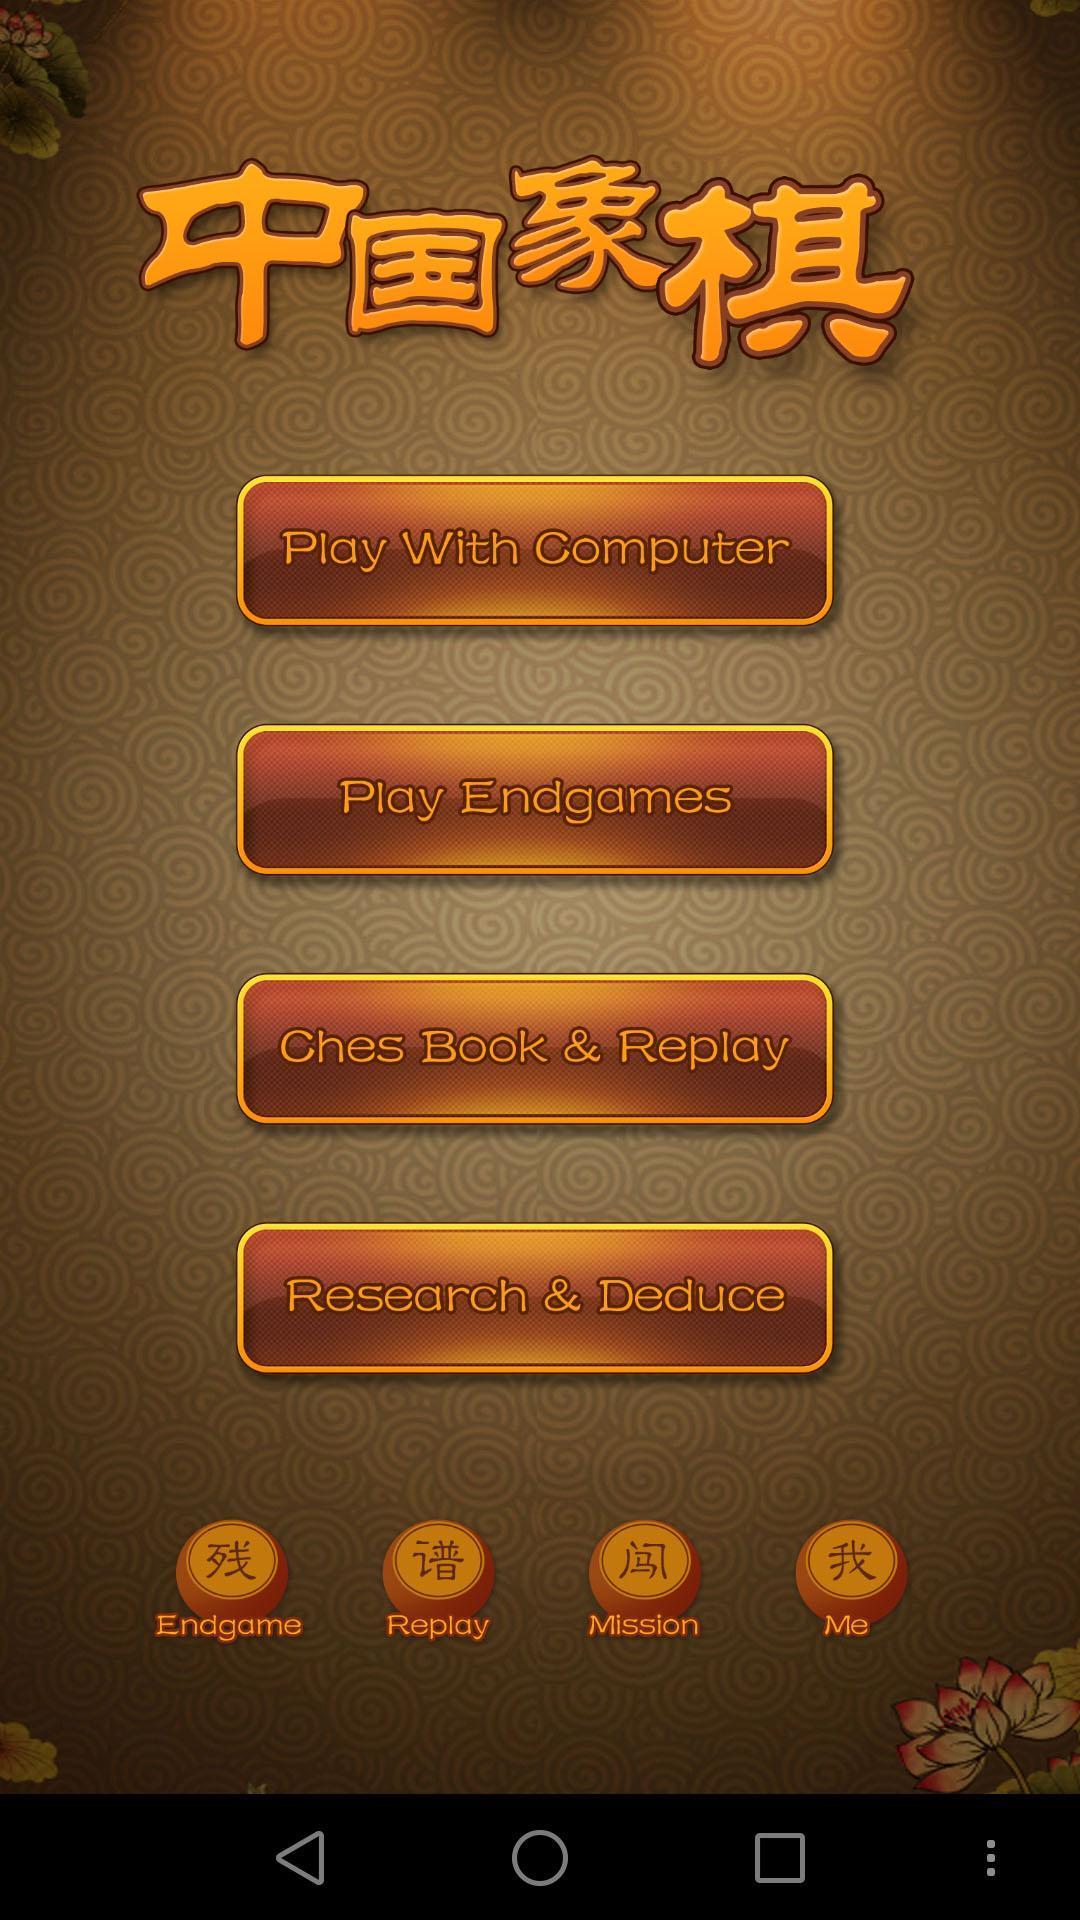 Chinese Chess, Xiangqi - many endgame and replay 3.9.6 Screenshot 1